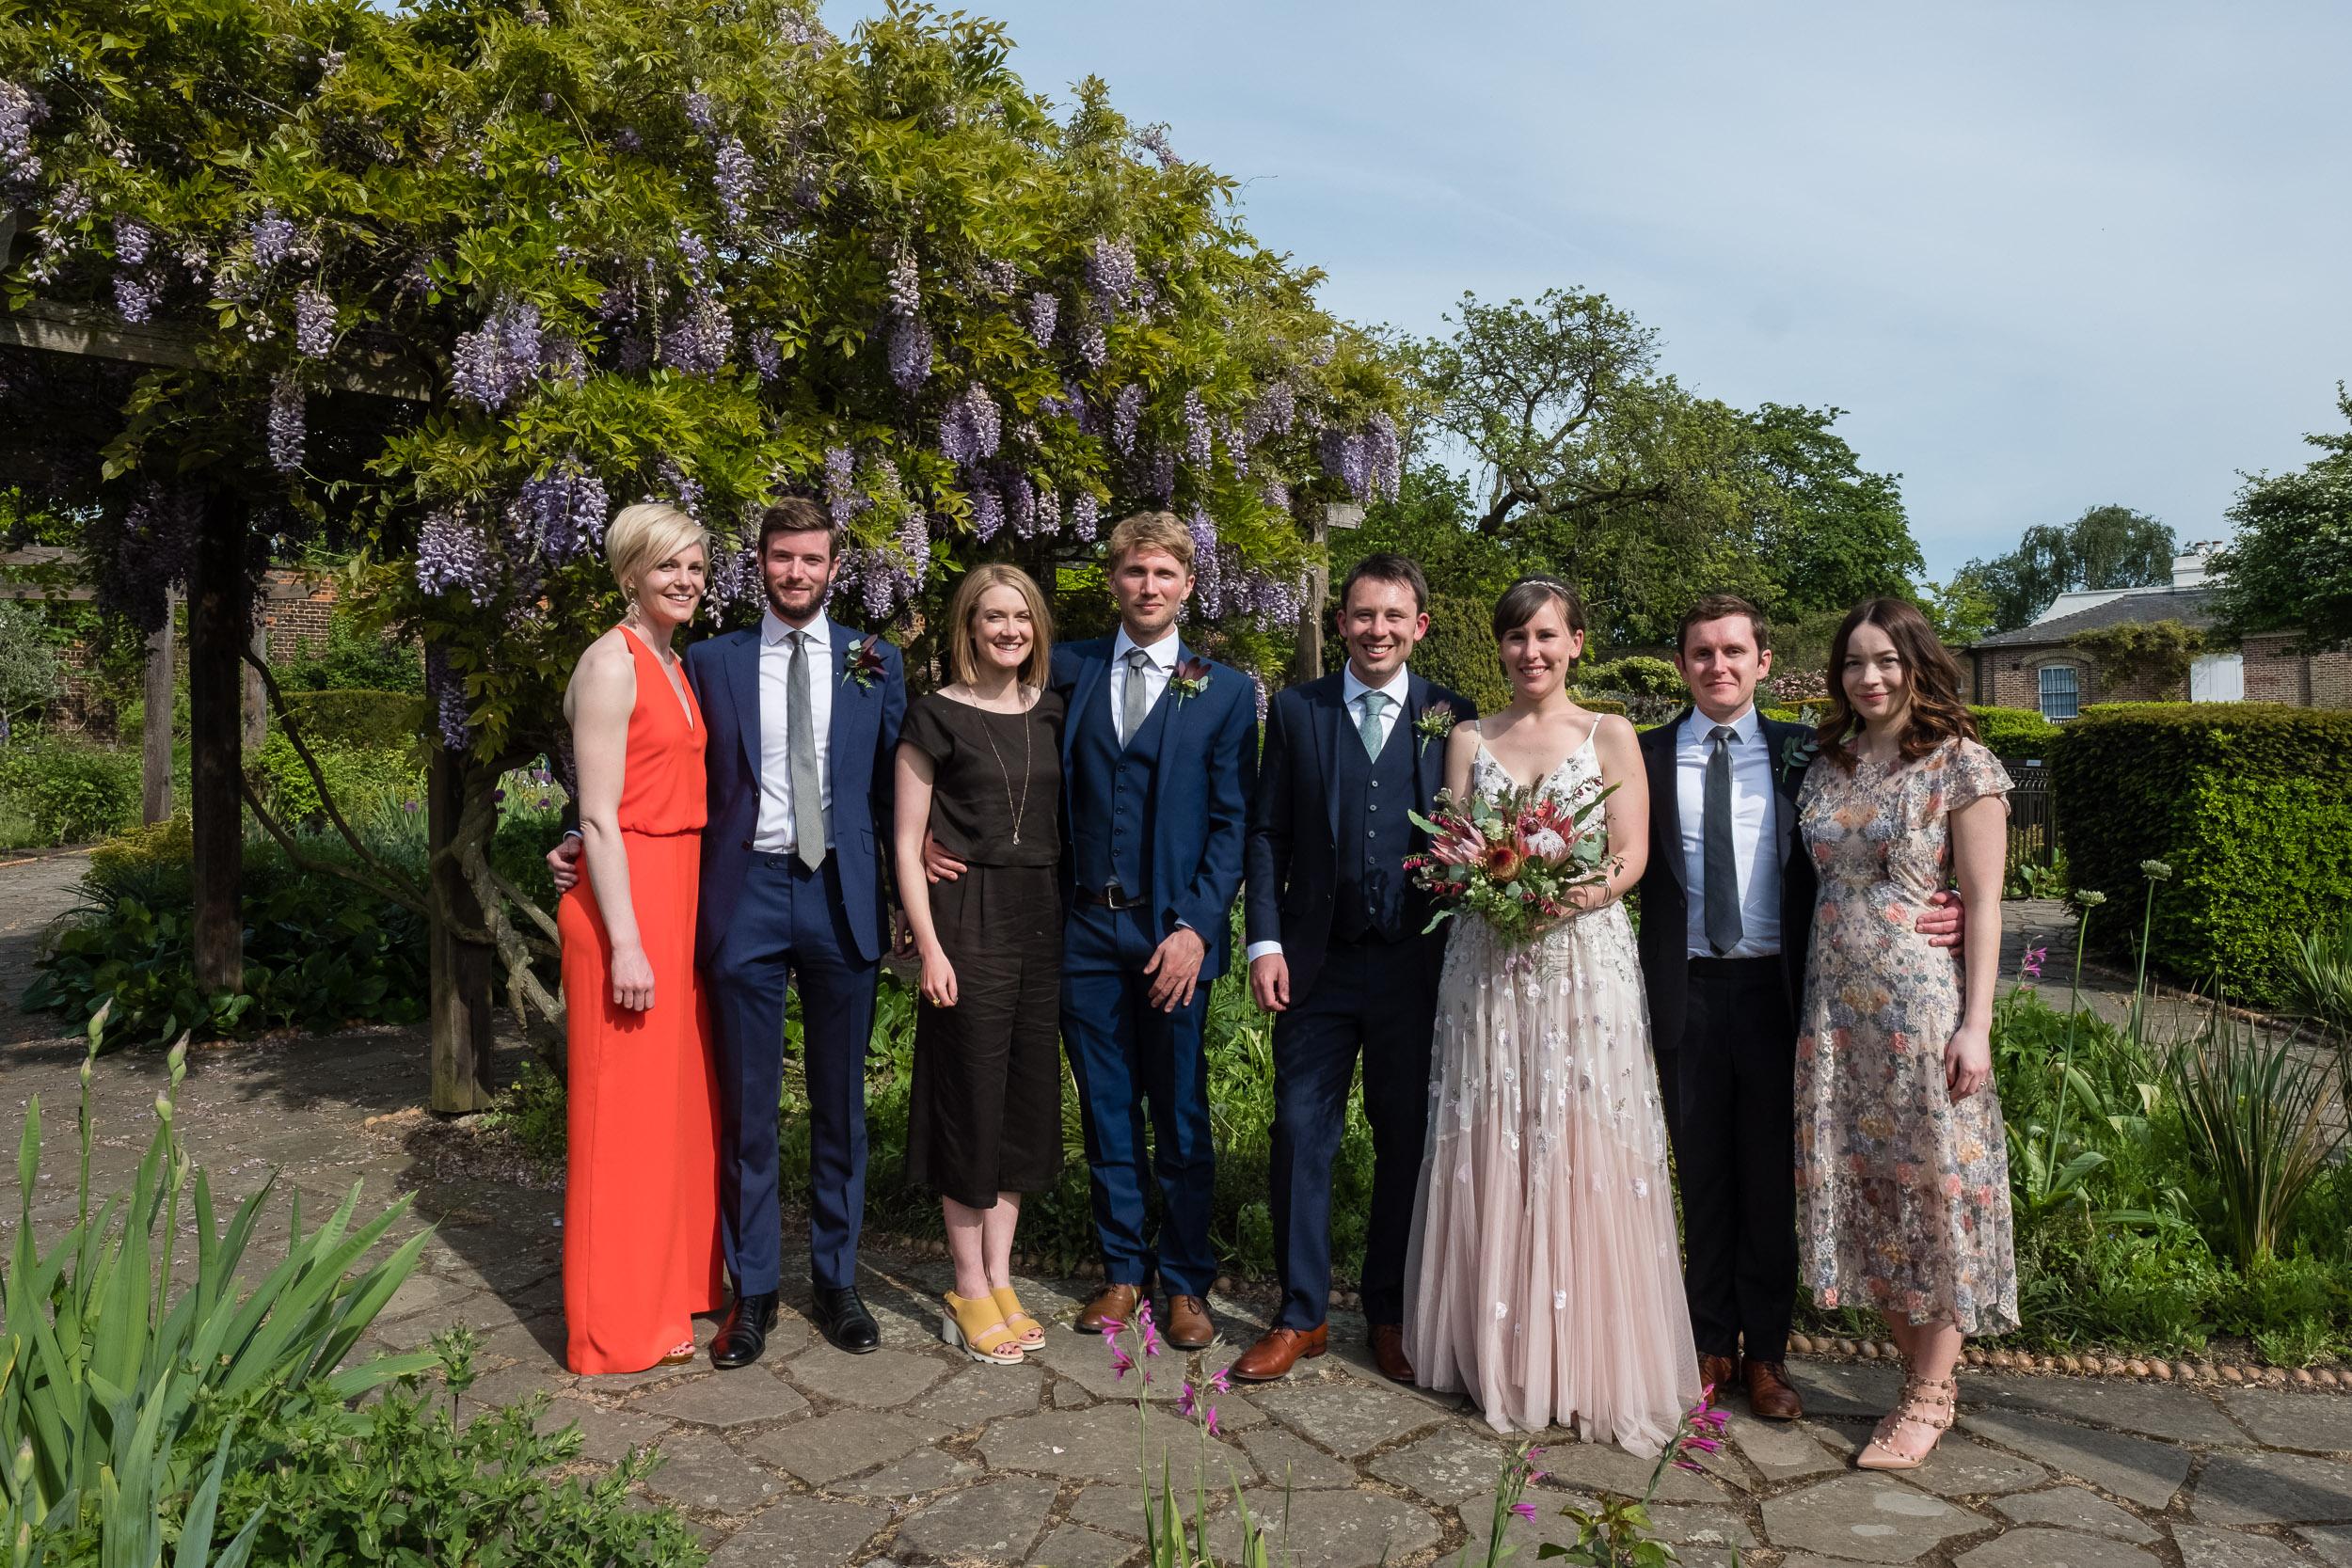 brockwell-lido-brixton-herne-hill-wedding-269.jpg